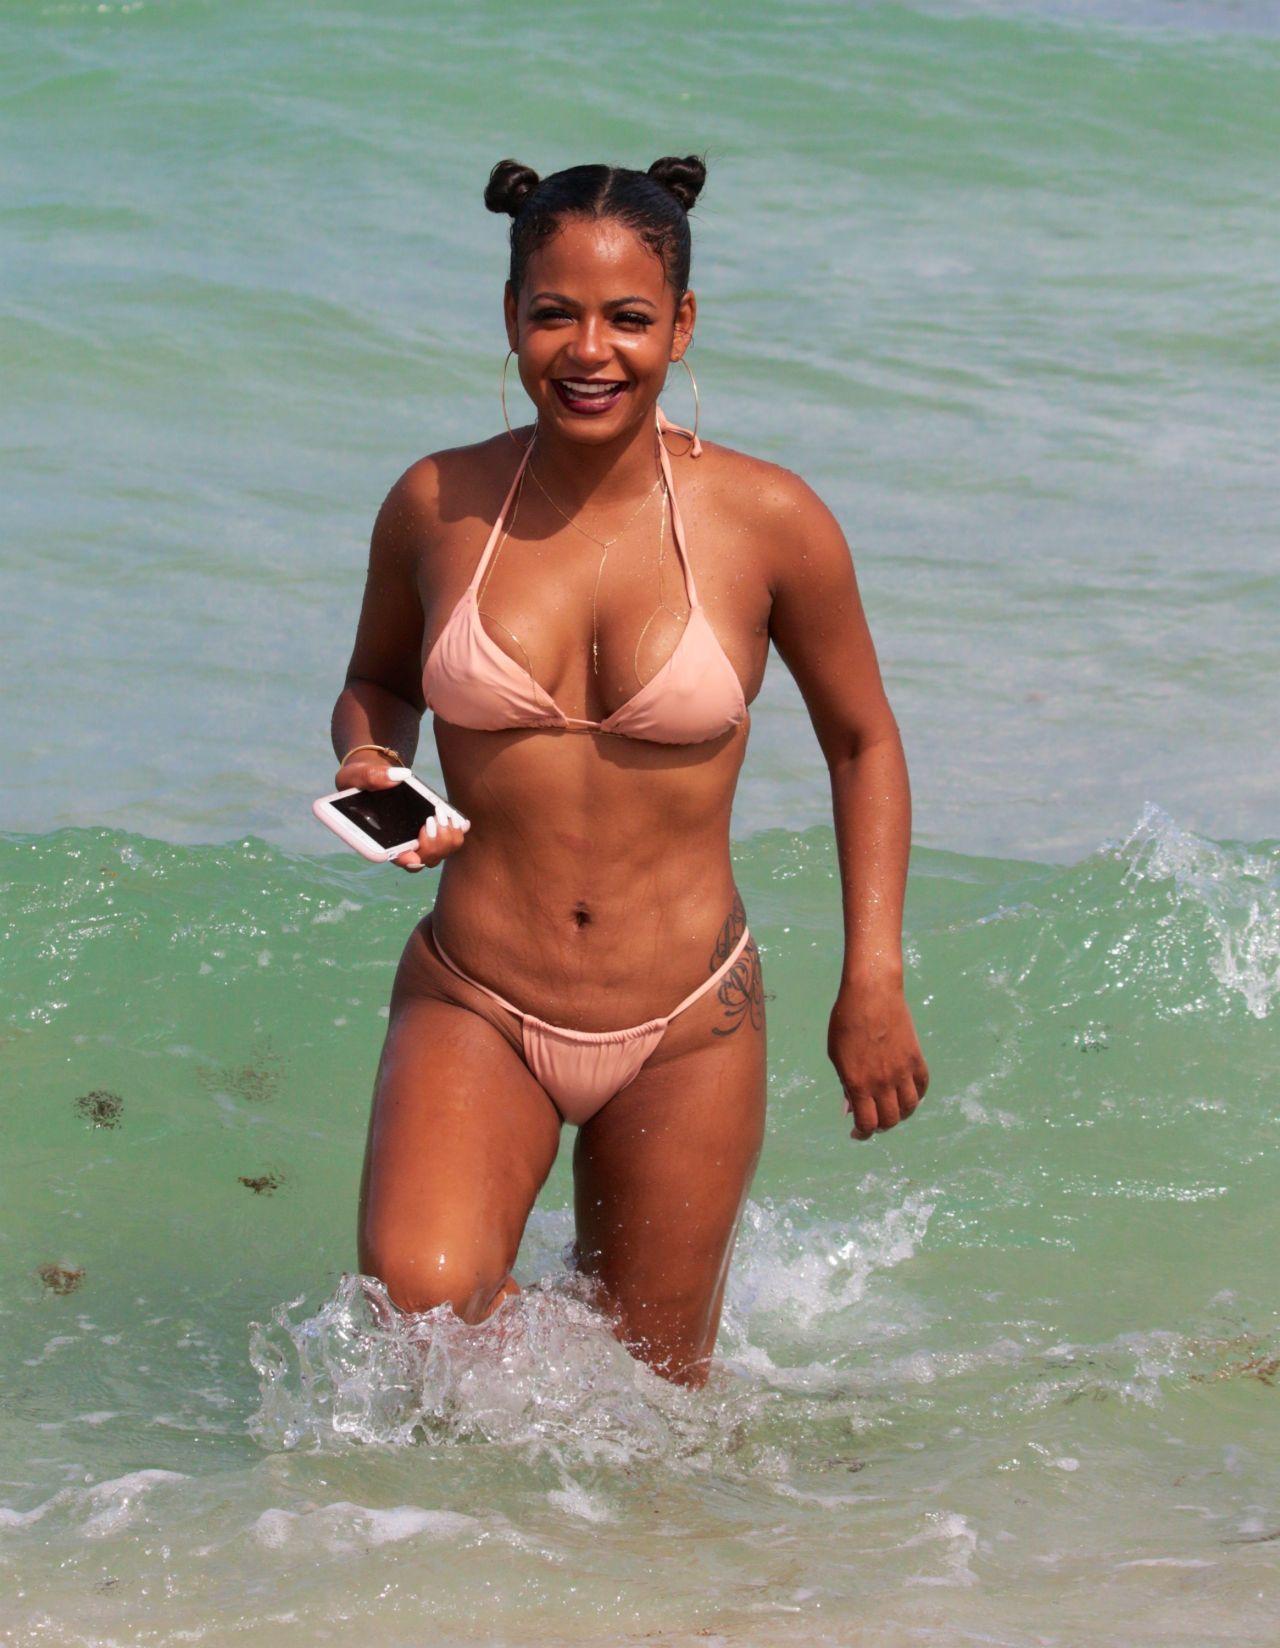 Christina milian sexy beach bikini selfie vid 8